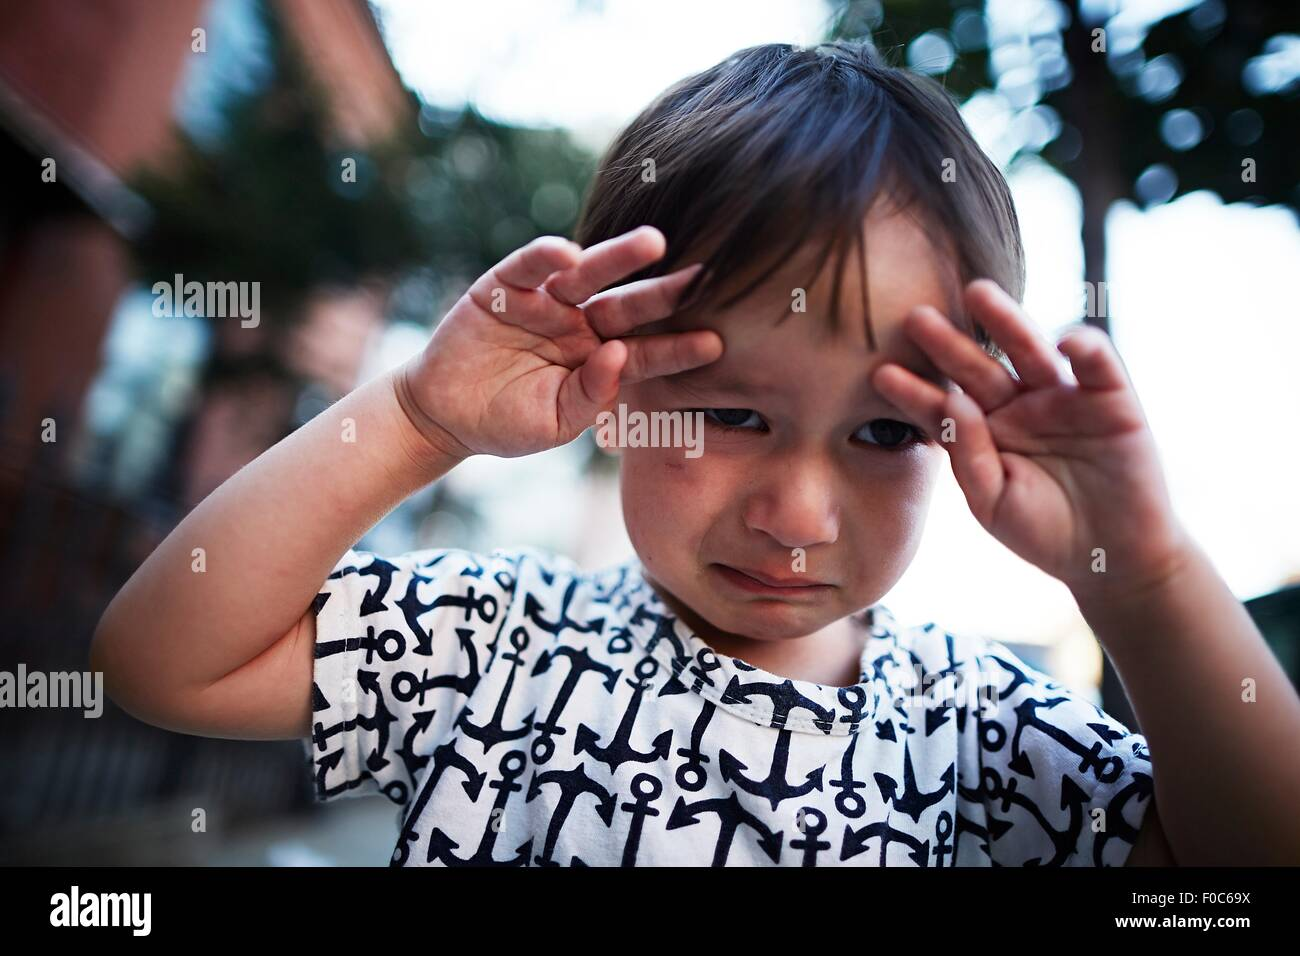 Portrait of boy crying on street - Stock Image